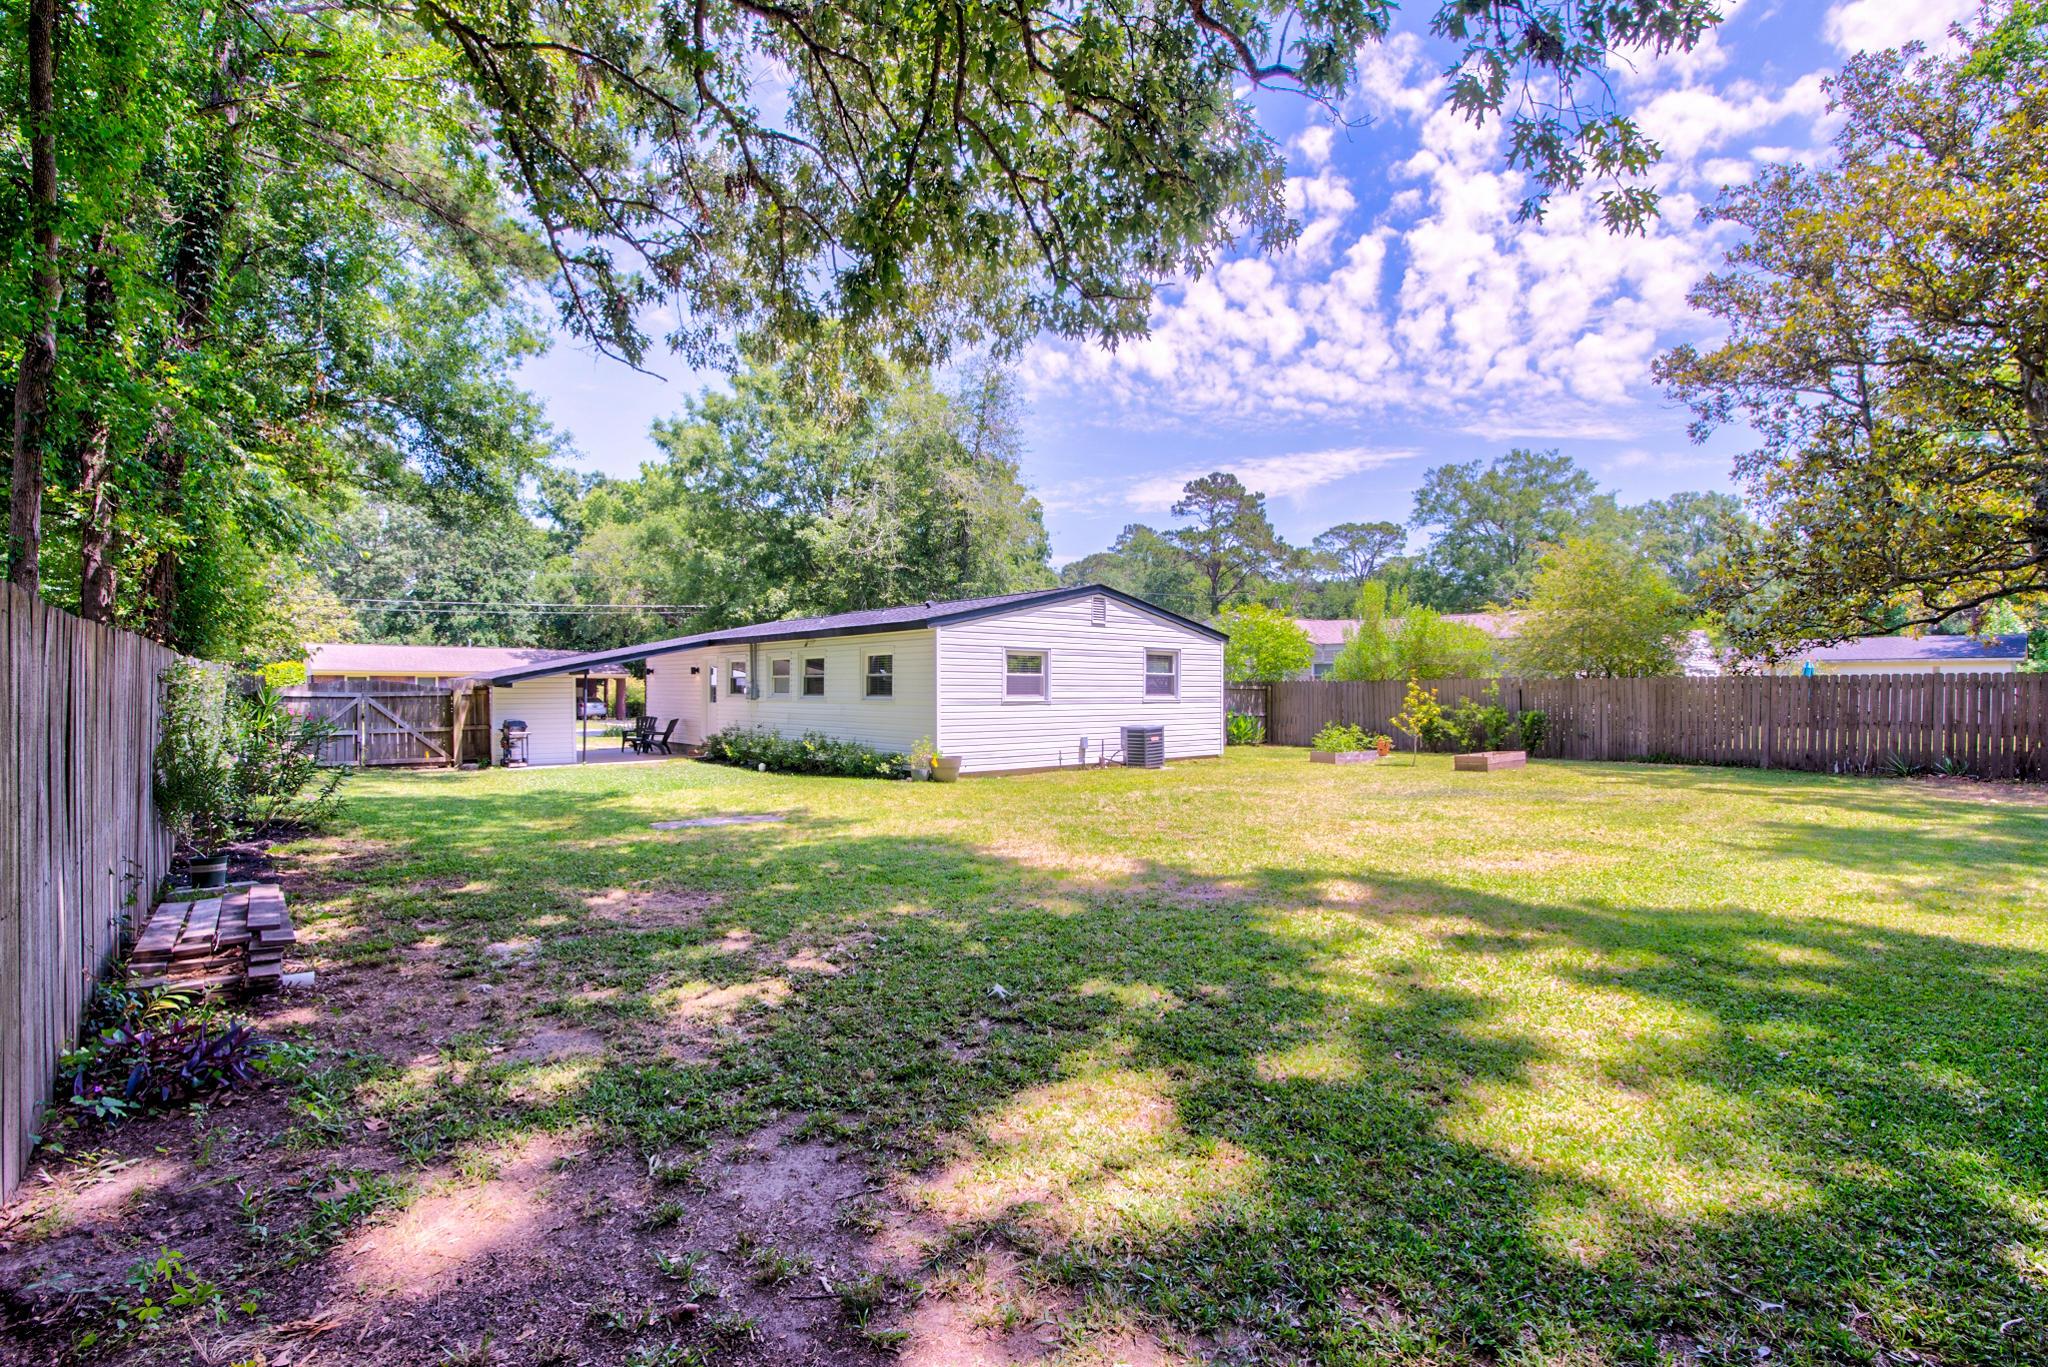 Oakland Homes For Sale - 2131 Clayton, Charleston, SC - 17